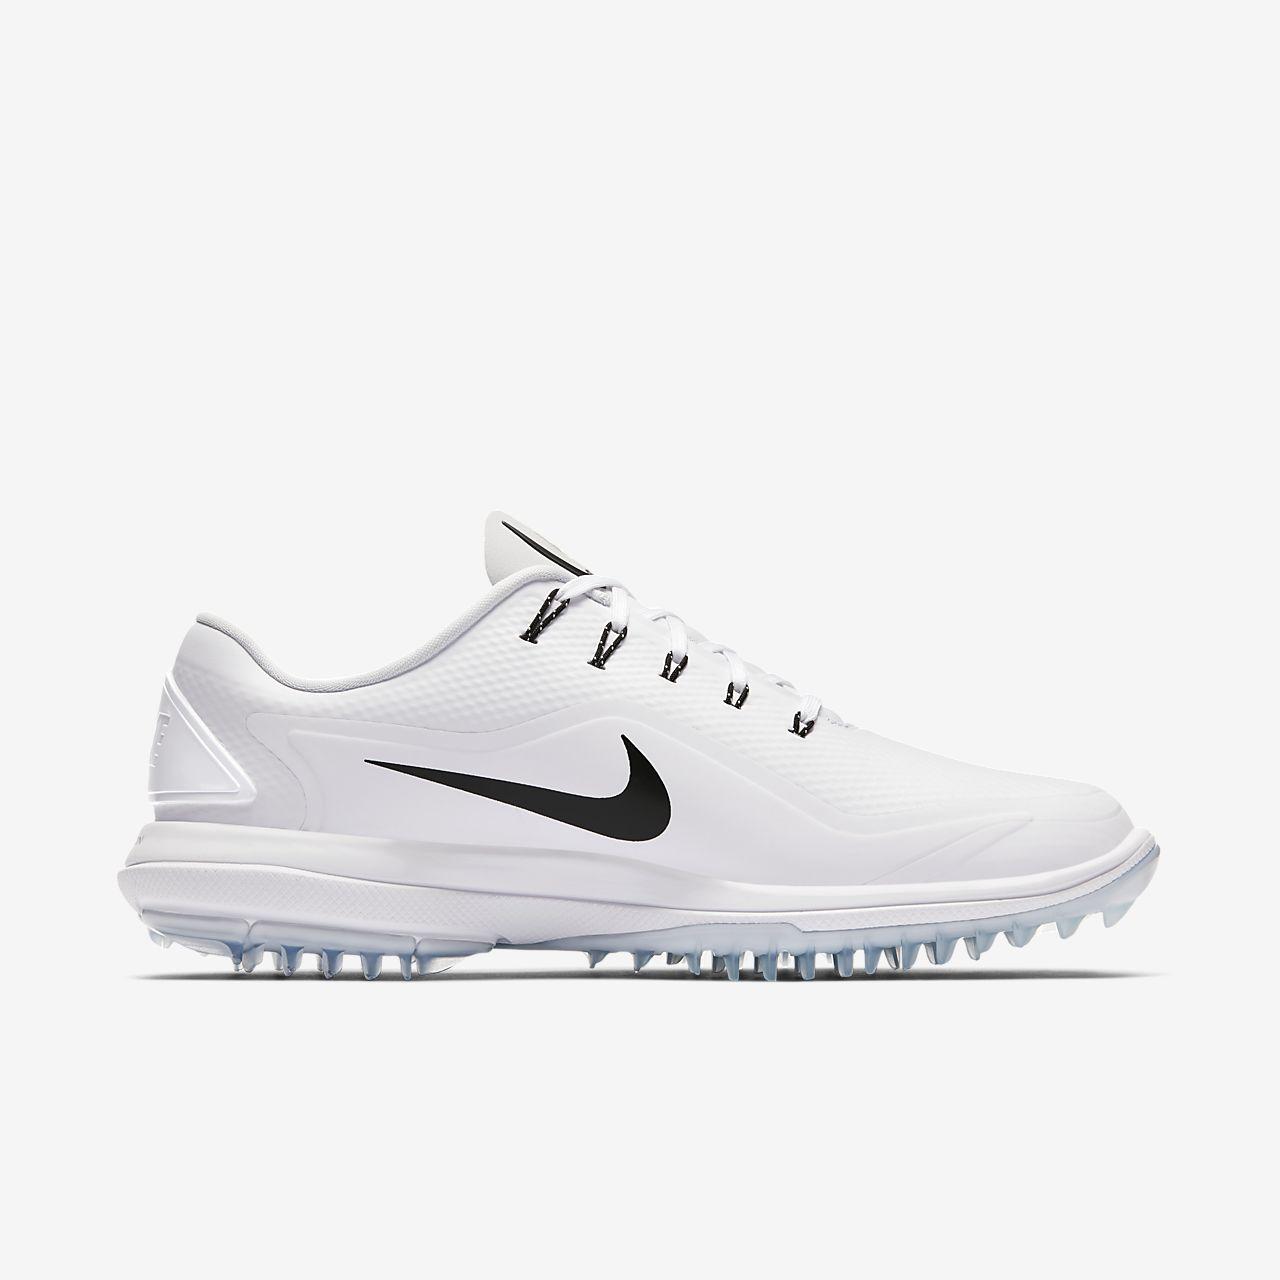 bb01ae54d0f6 Nike Lunar Control Vapor 2 Men s Golf Shoe. Nike.com IN